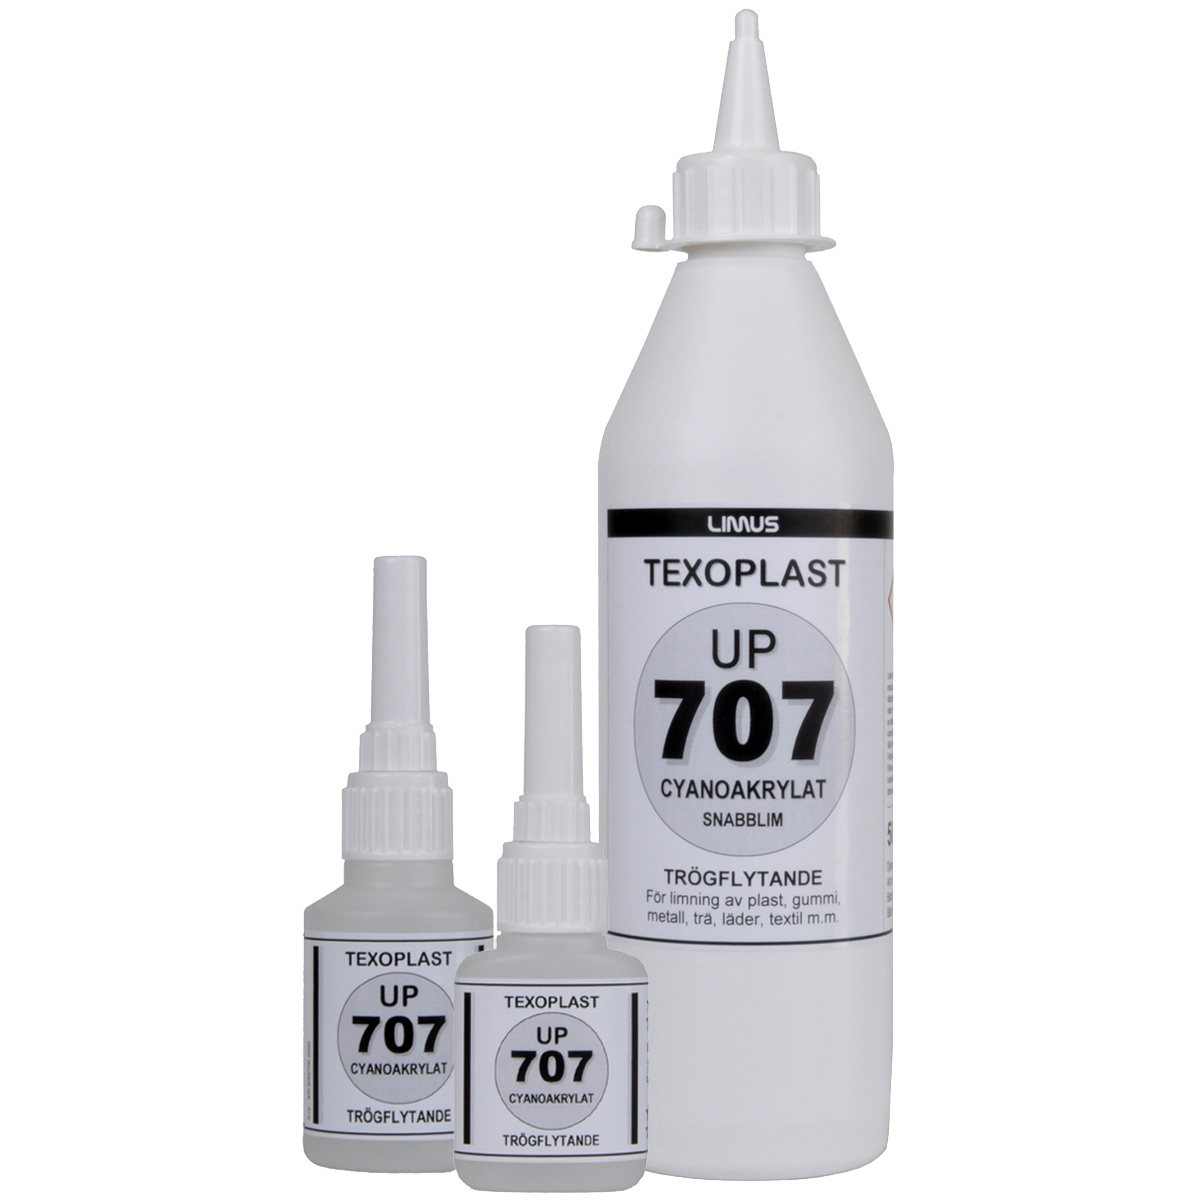 TEXOPLAST UP707